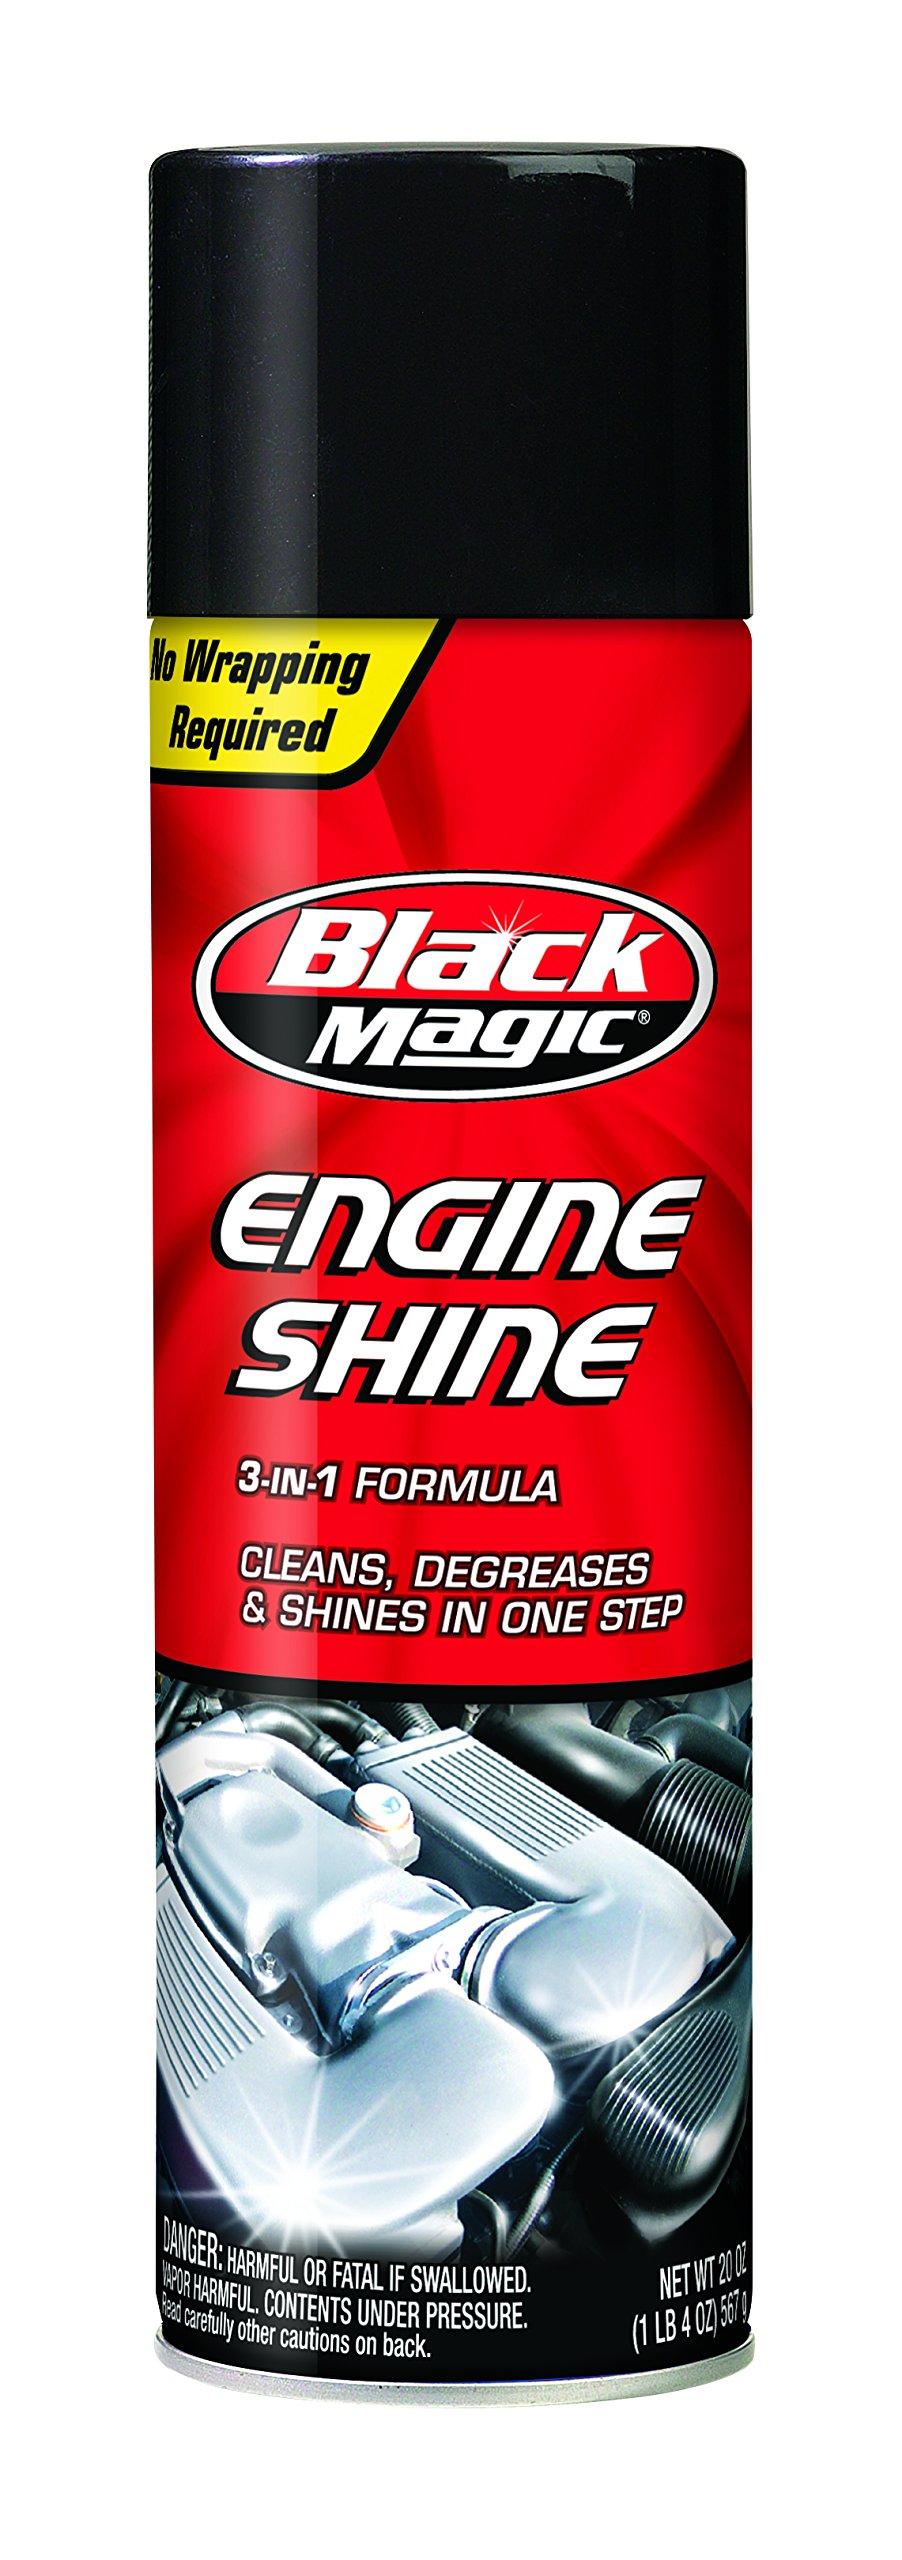 Black Magic BM22018-6PK 2-in-1 Engine Shine, 20 oz. (Pack of 6)